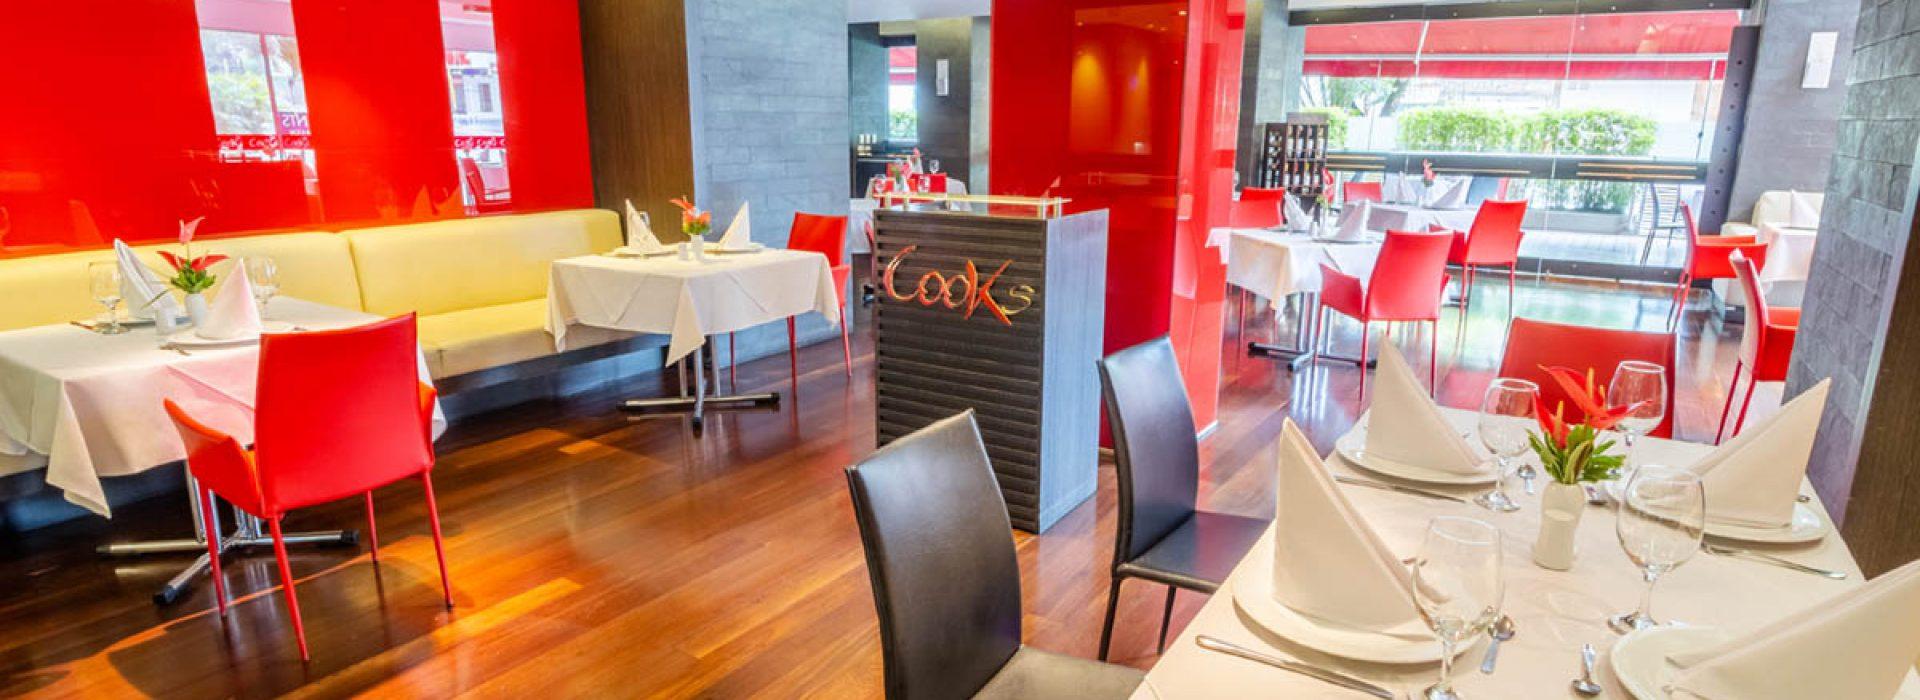 Restaurante Cook's 3